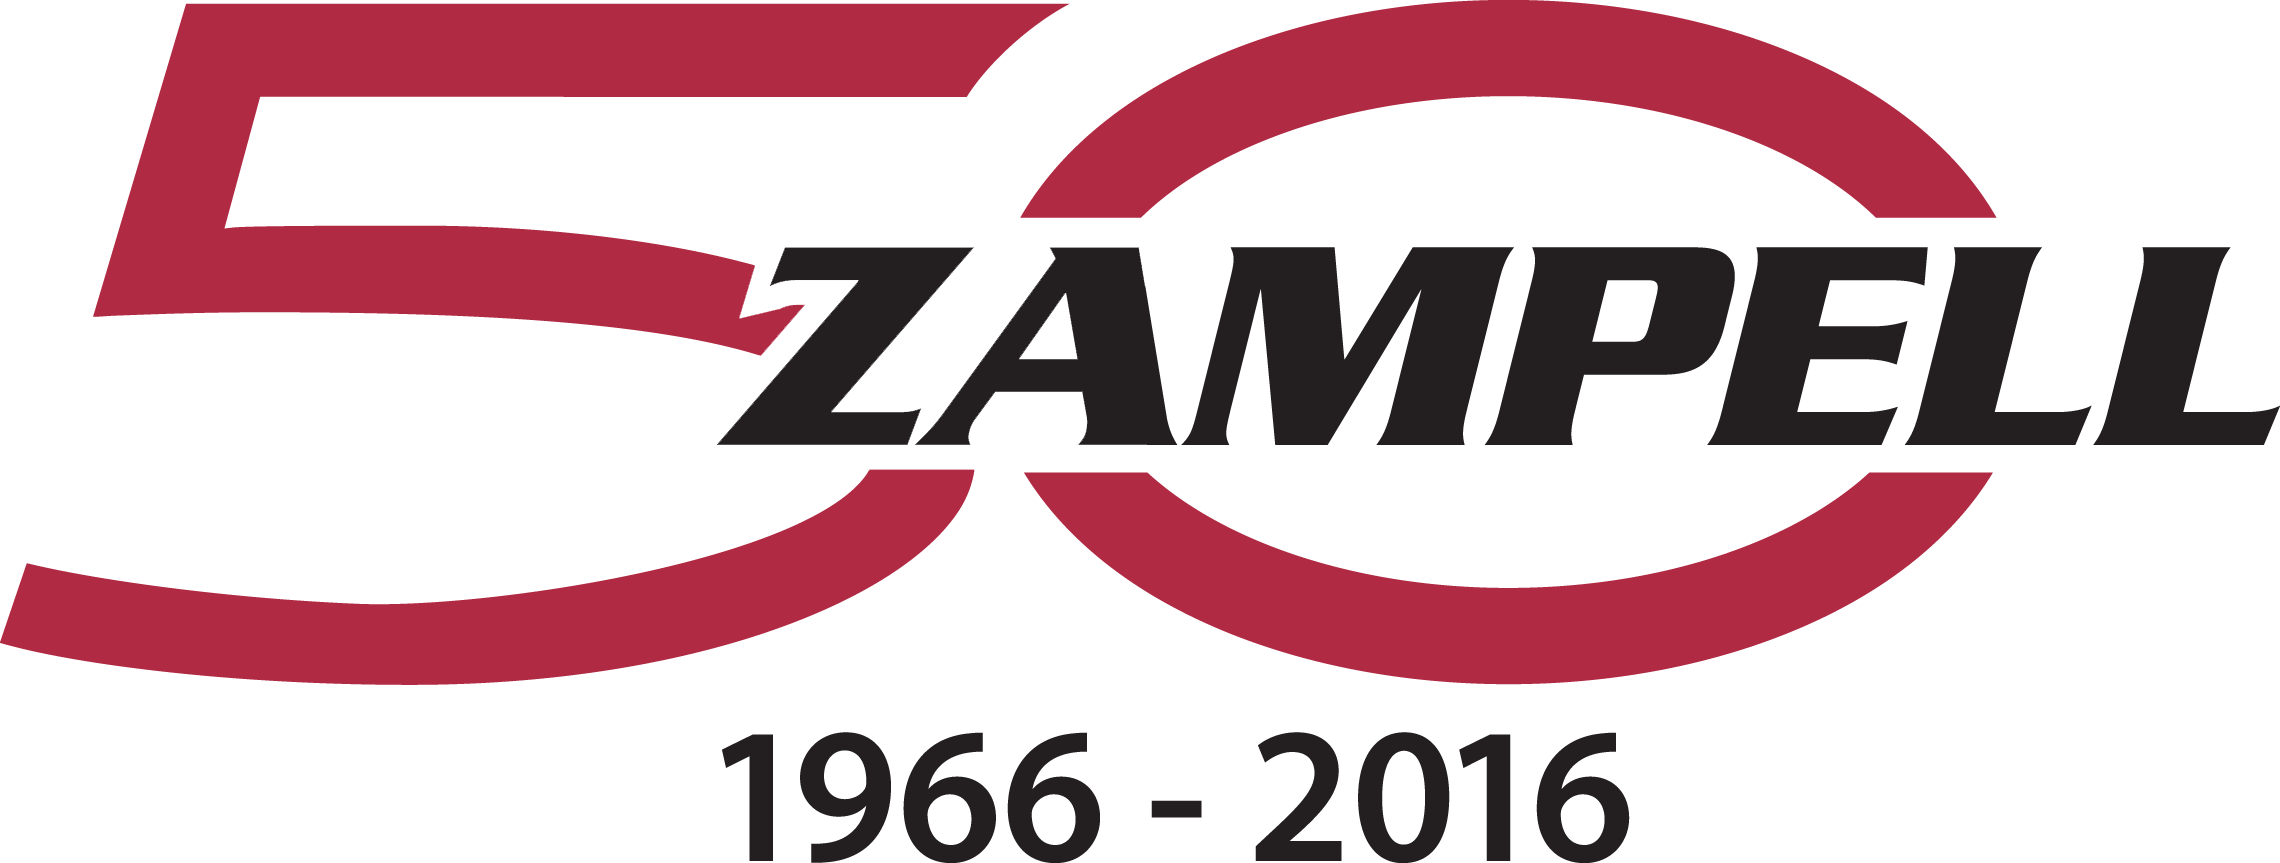 Zampell50_logo.png